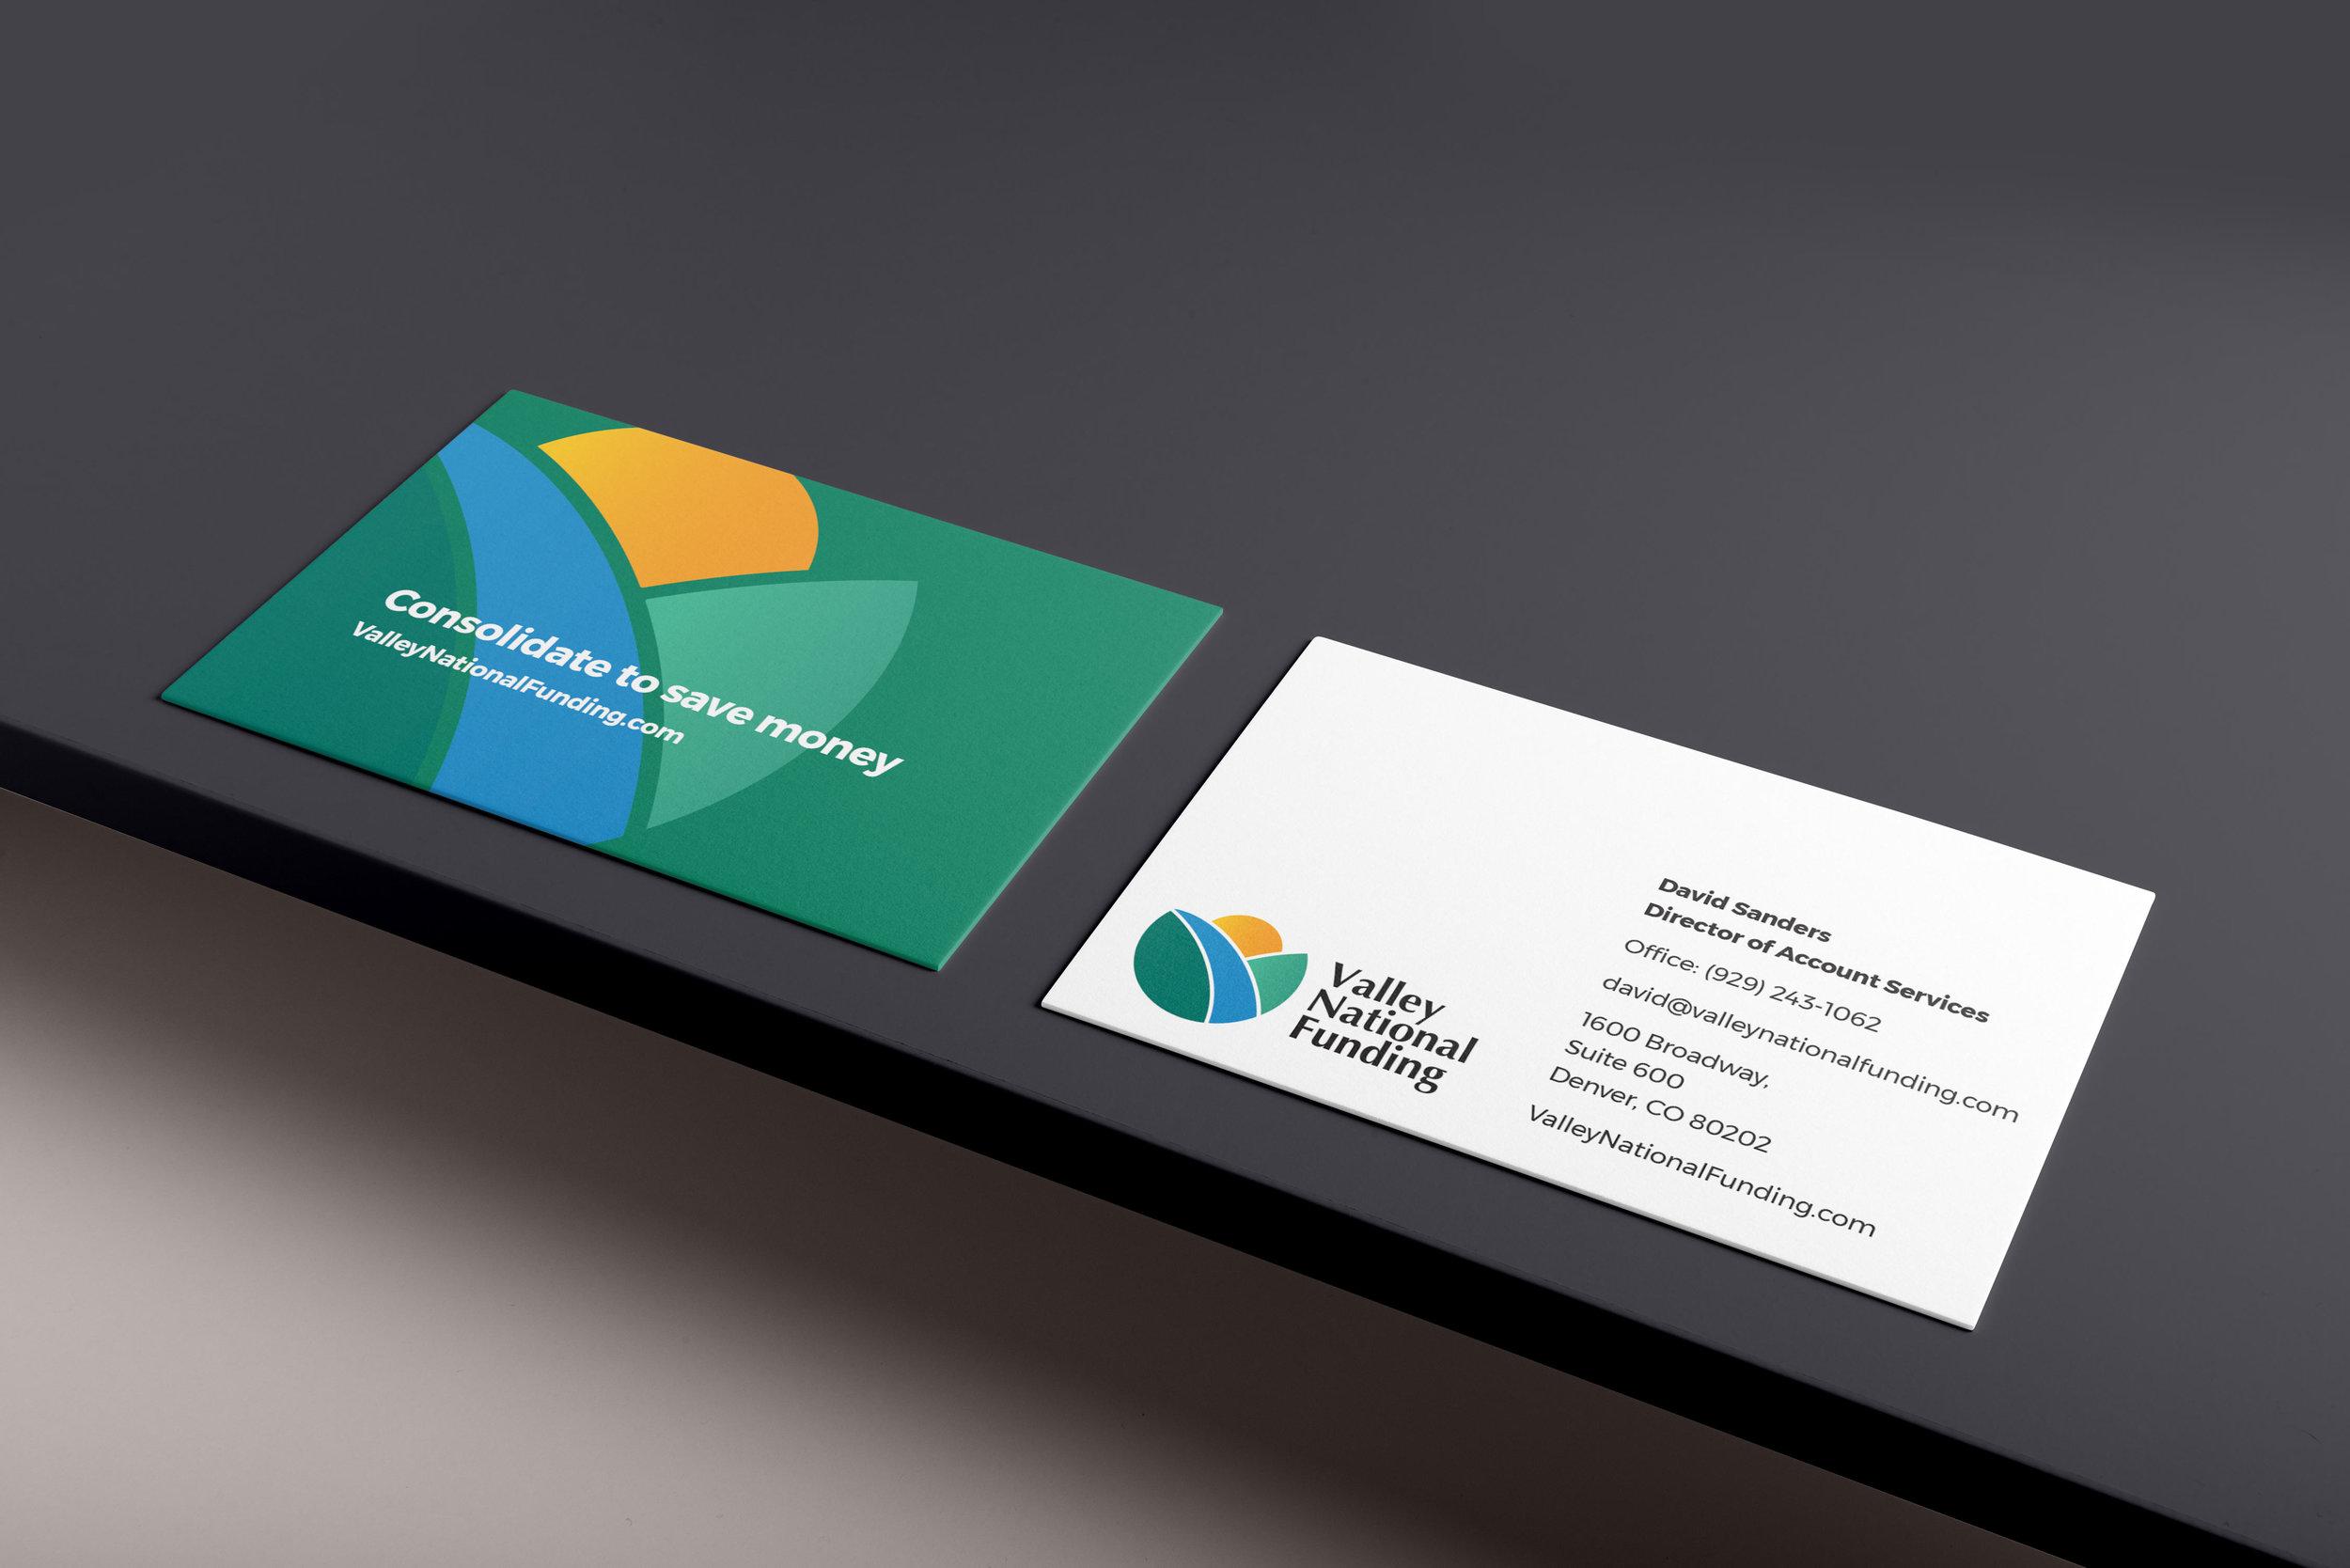 Valley National Funding - Logo Design